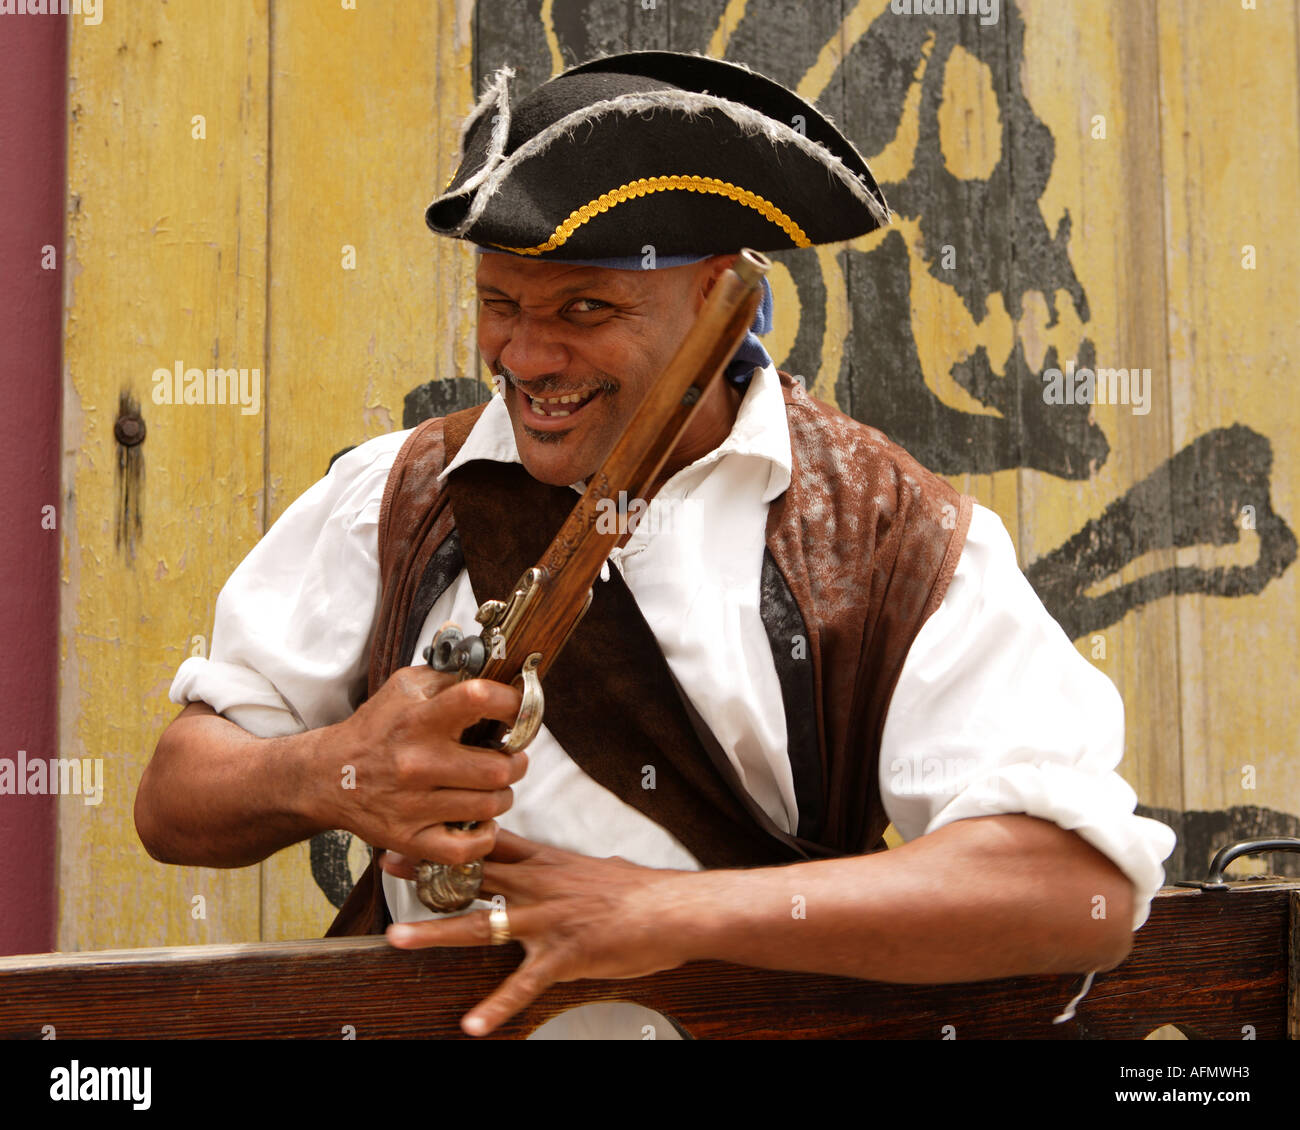 Pirate actor outside the Pirates of Nassau Museum, Nassau, New Providence, Bahamas. - Stock Image